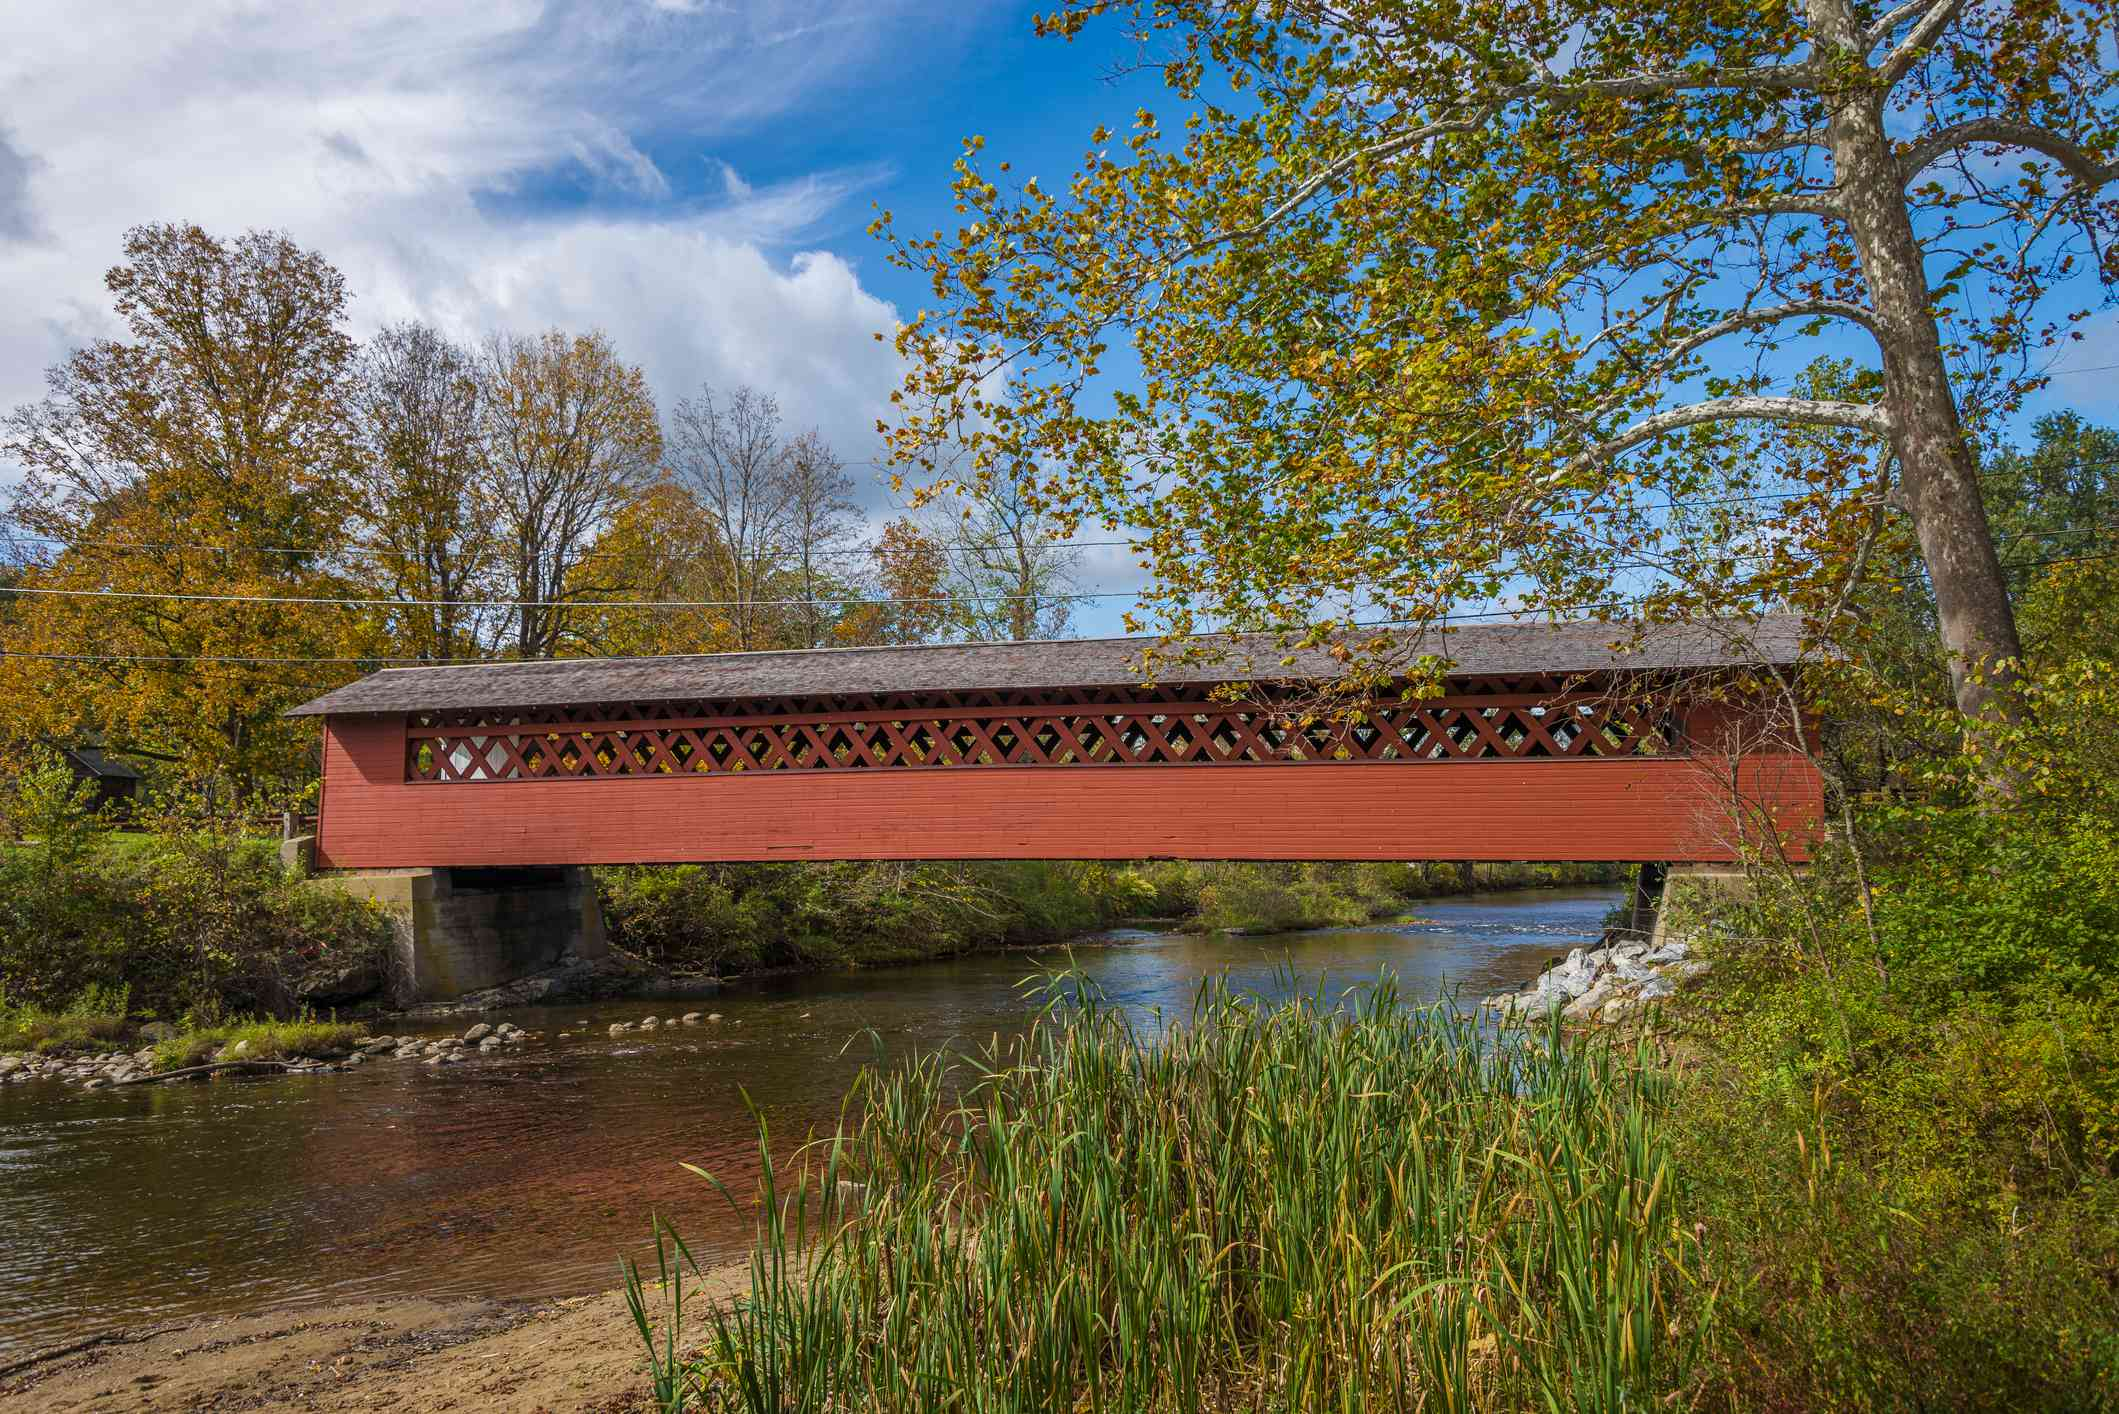 Red Covered Bridge in Bennington, Vermont